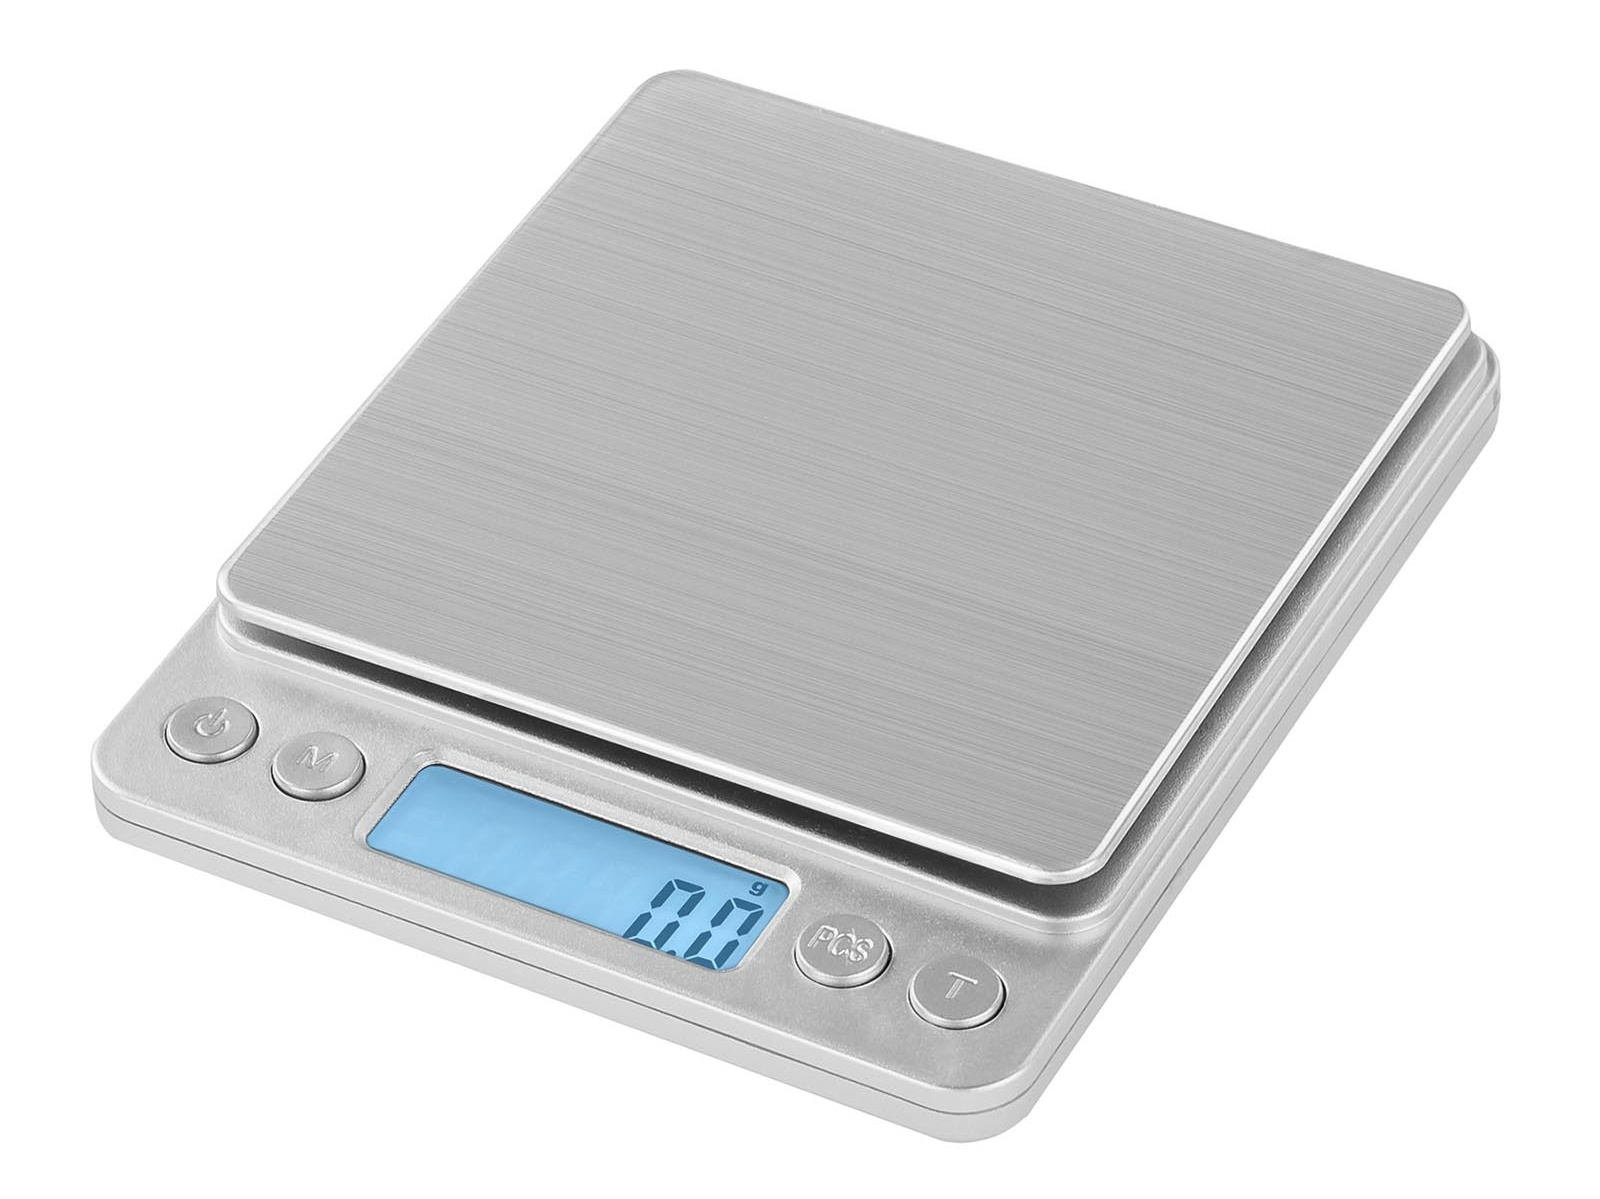 Digitálna-váha-500-g001-g-10-x-10-cm